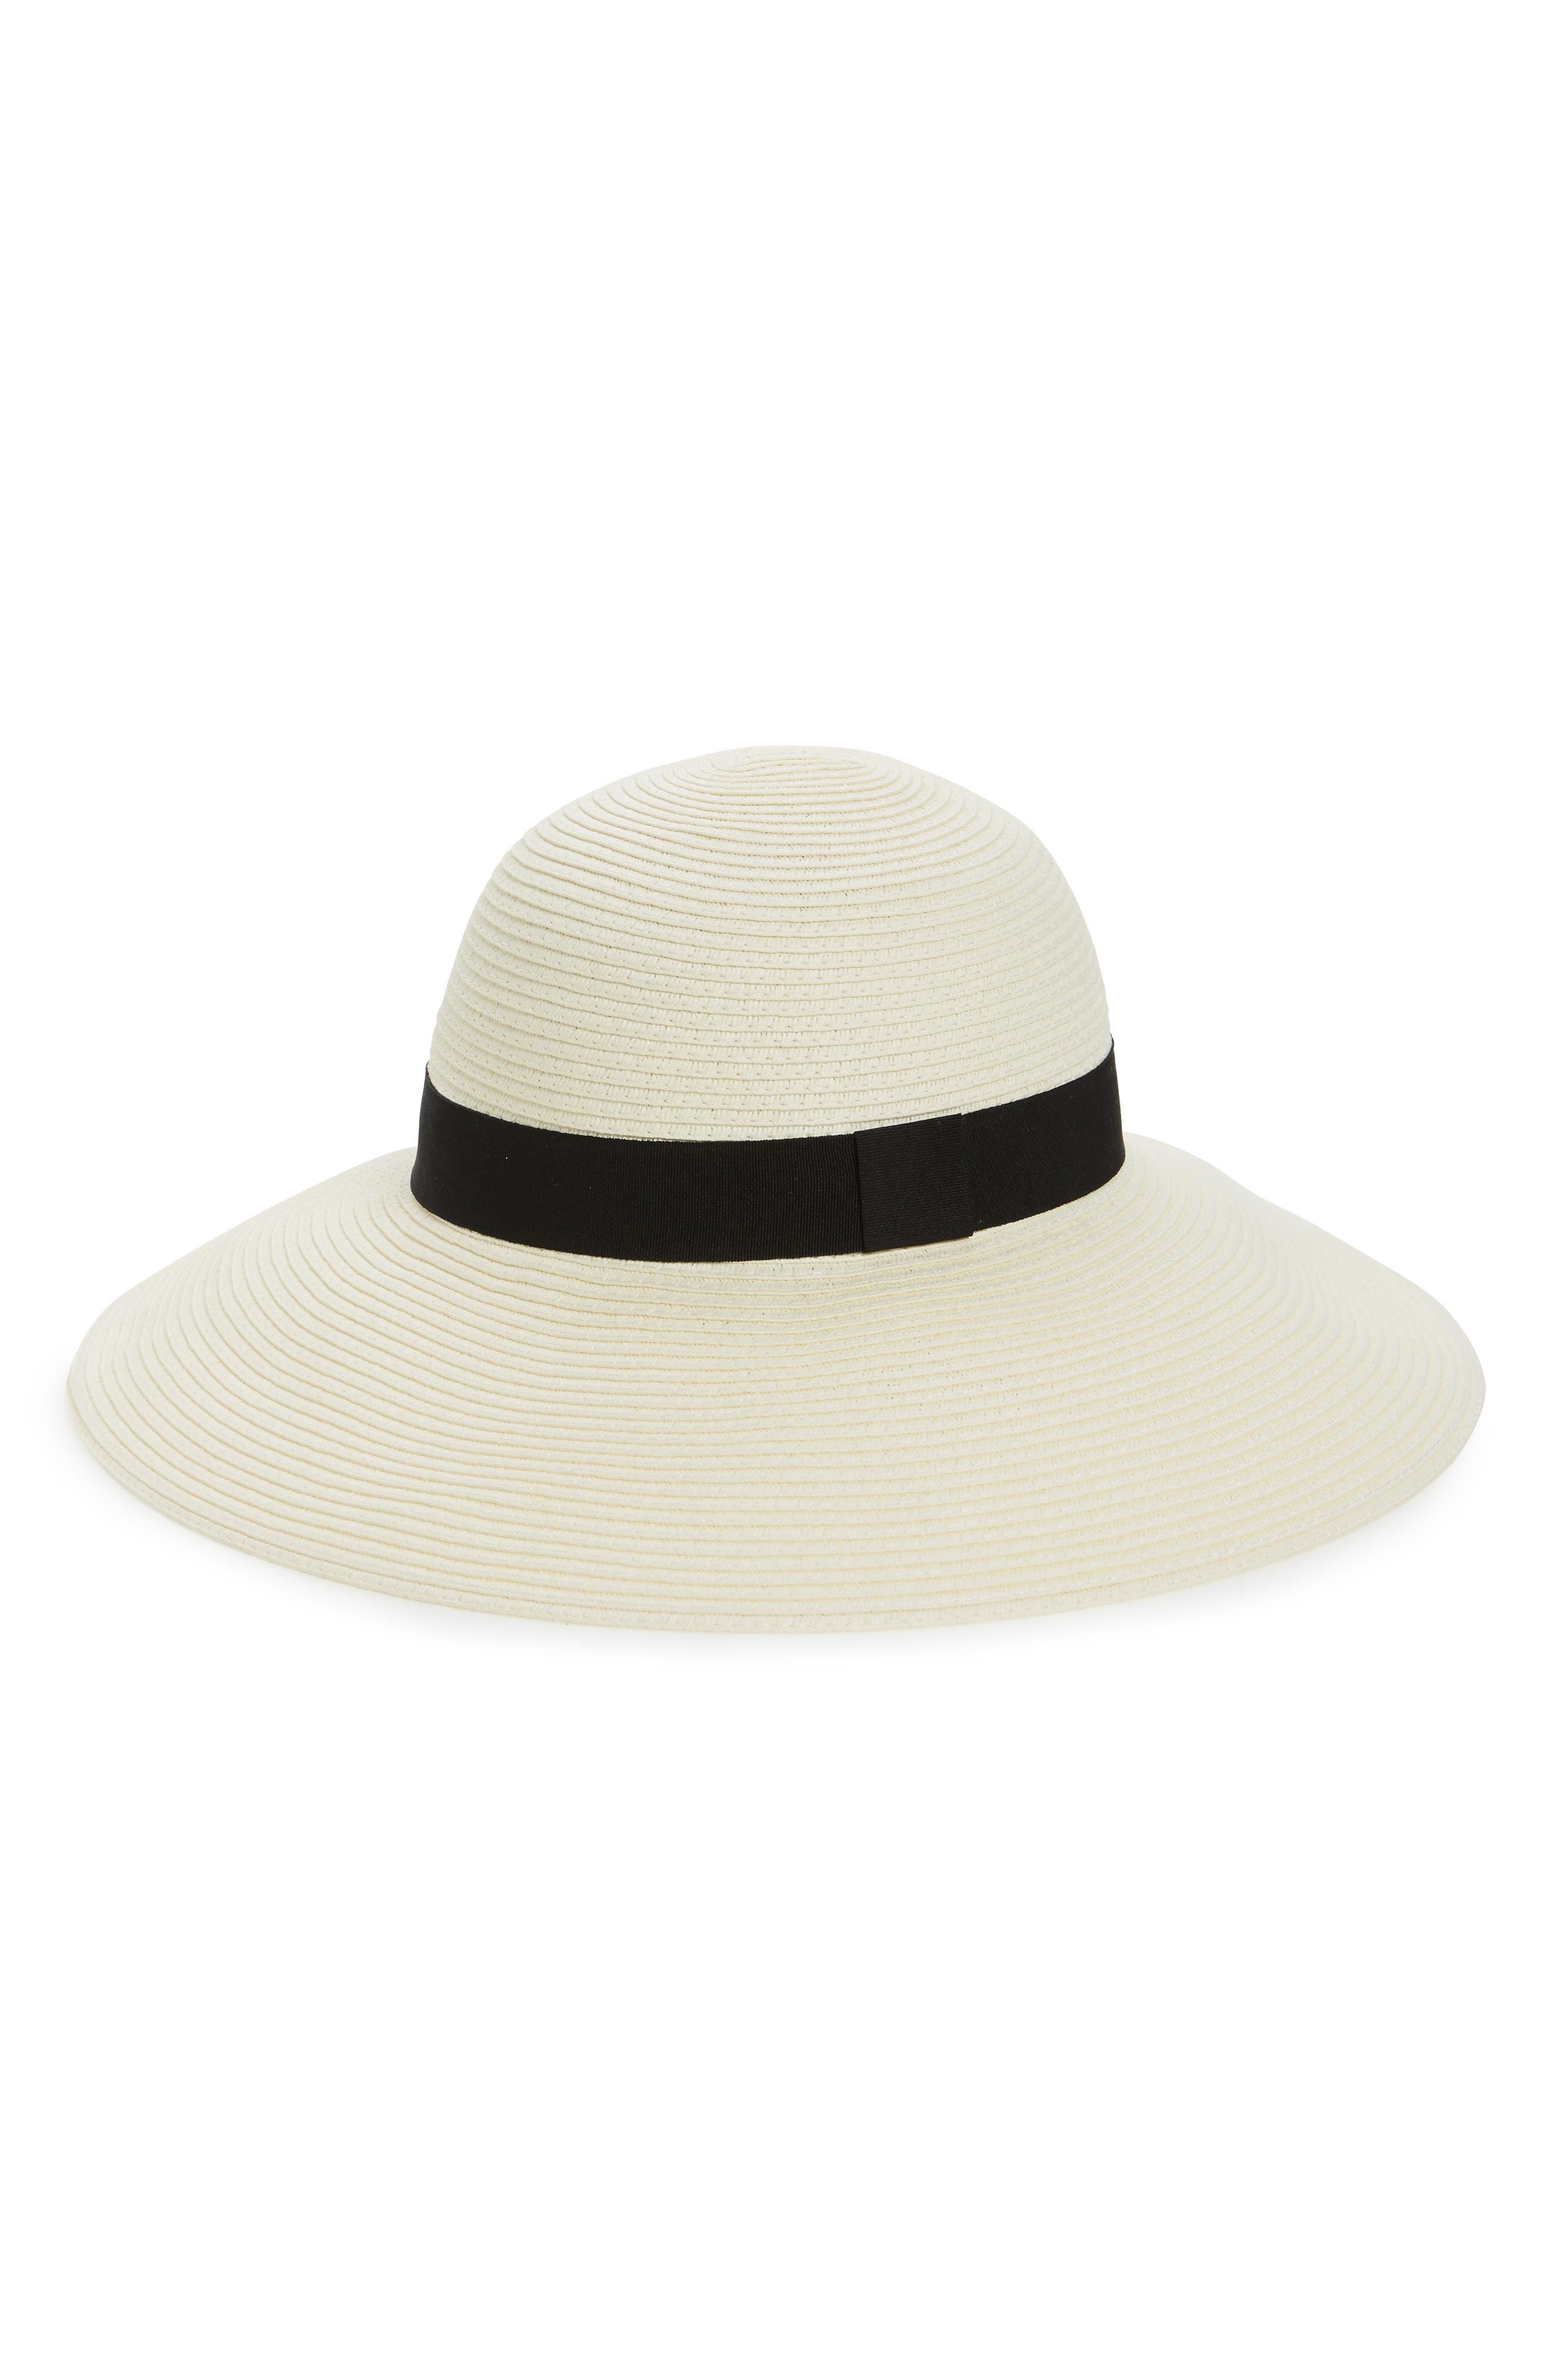 Alternate Image 1 Selected - Halogen® Floppy Hat